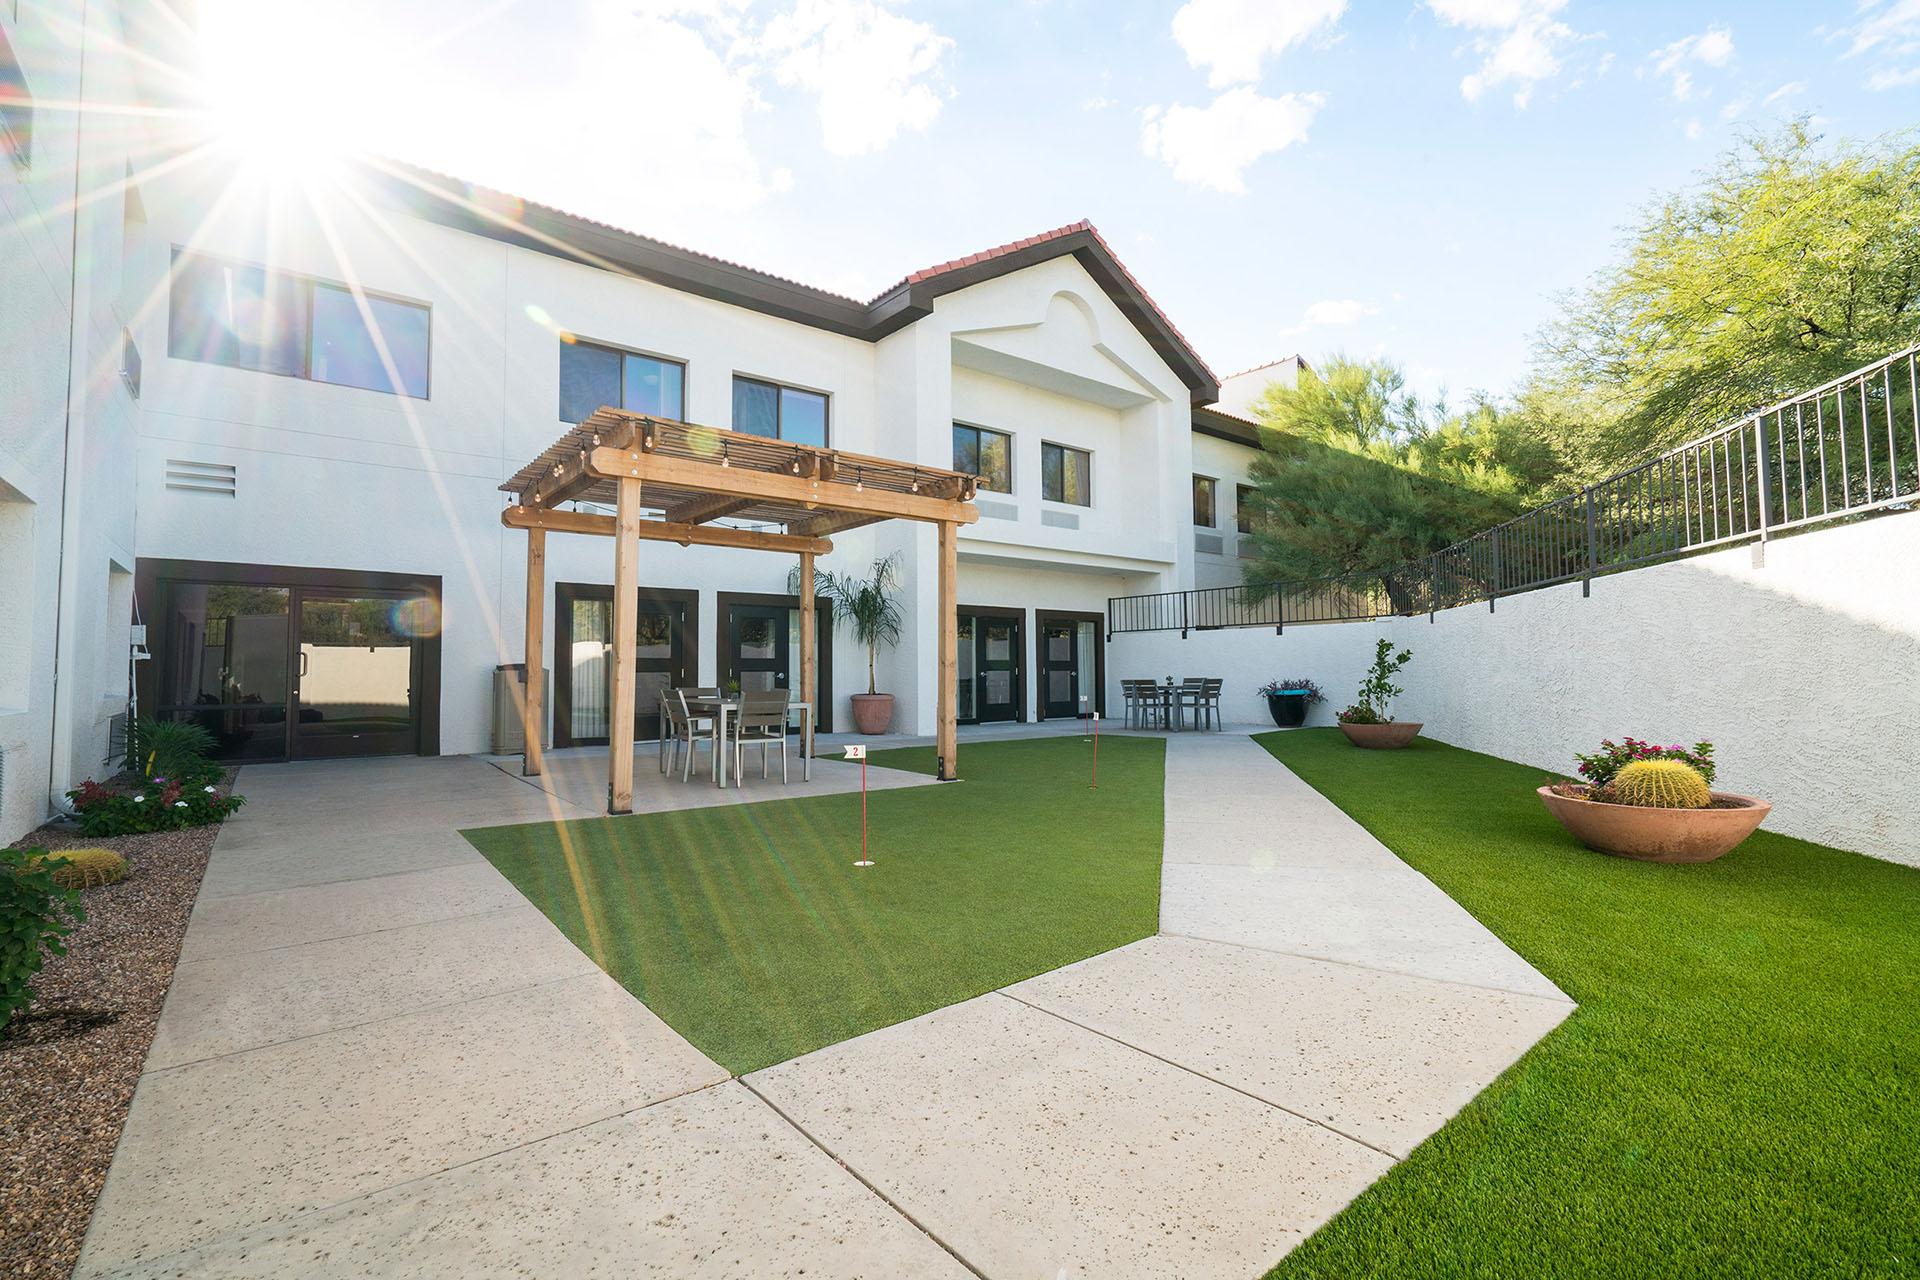 A green lawn and pergola